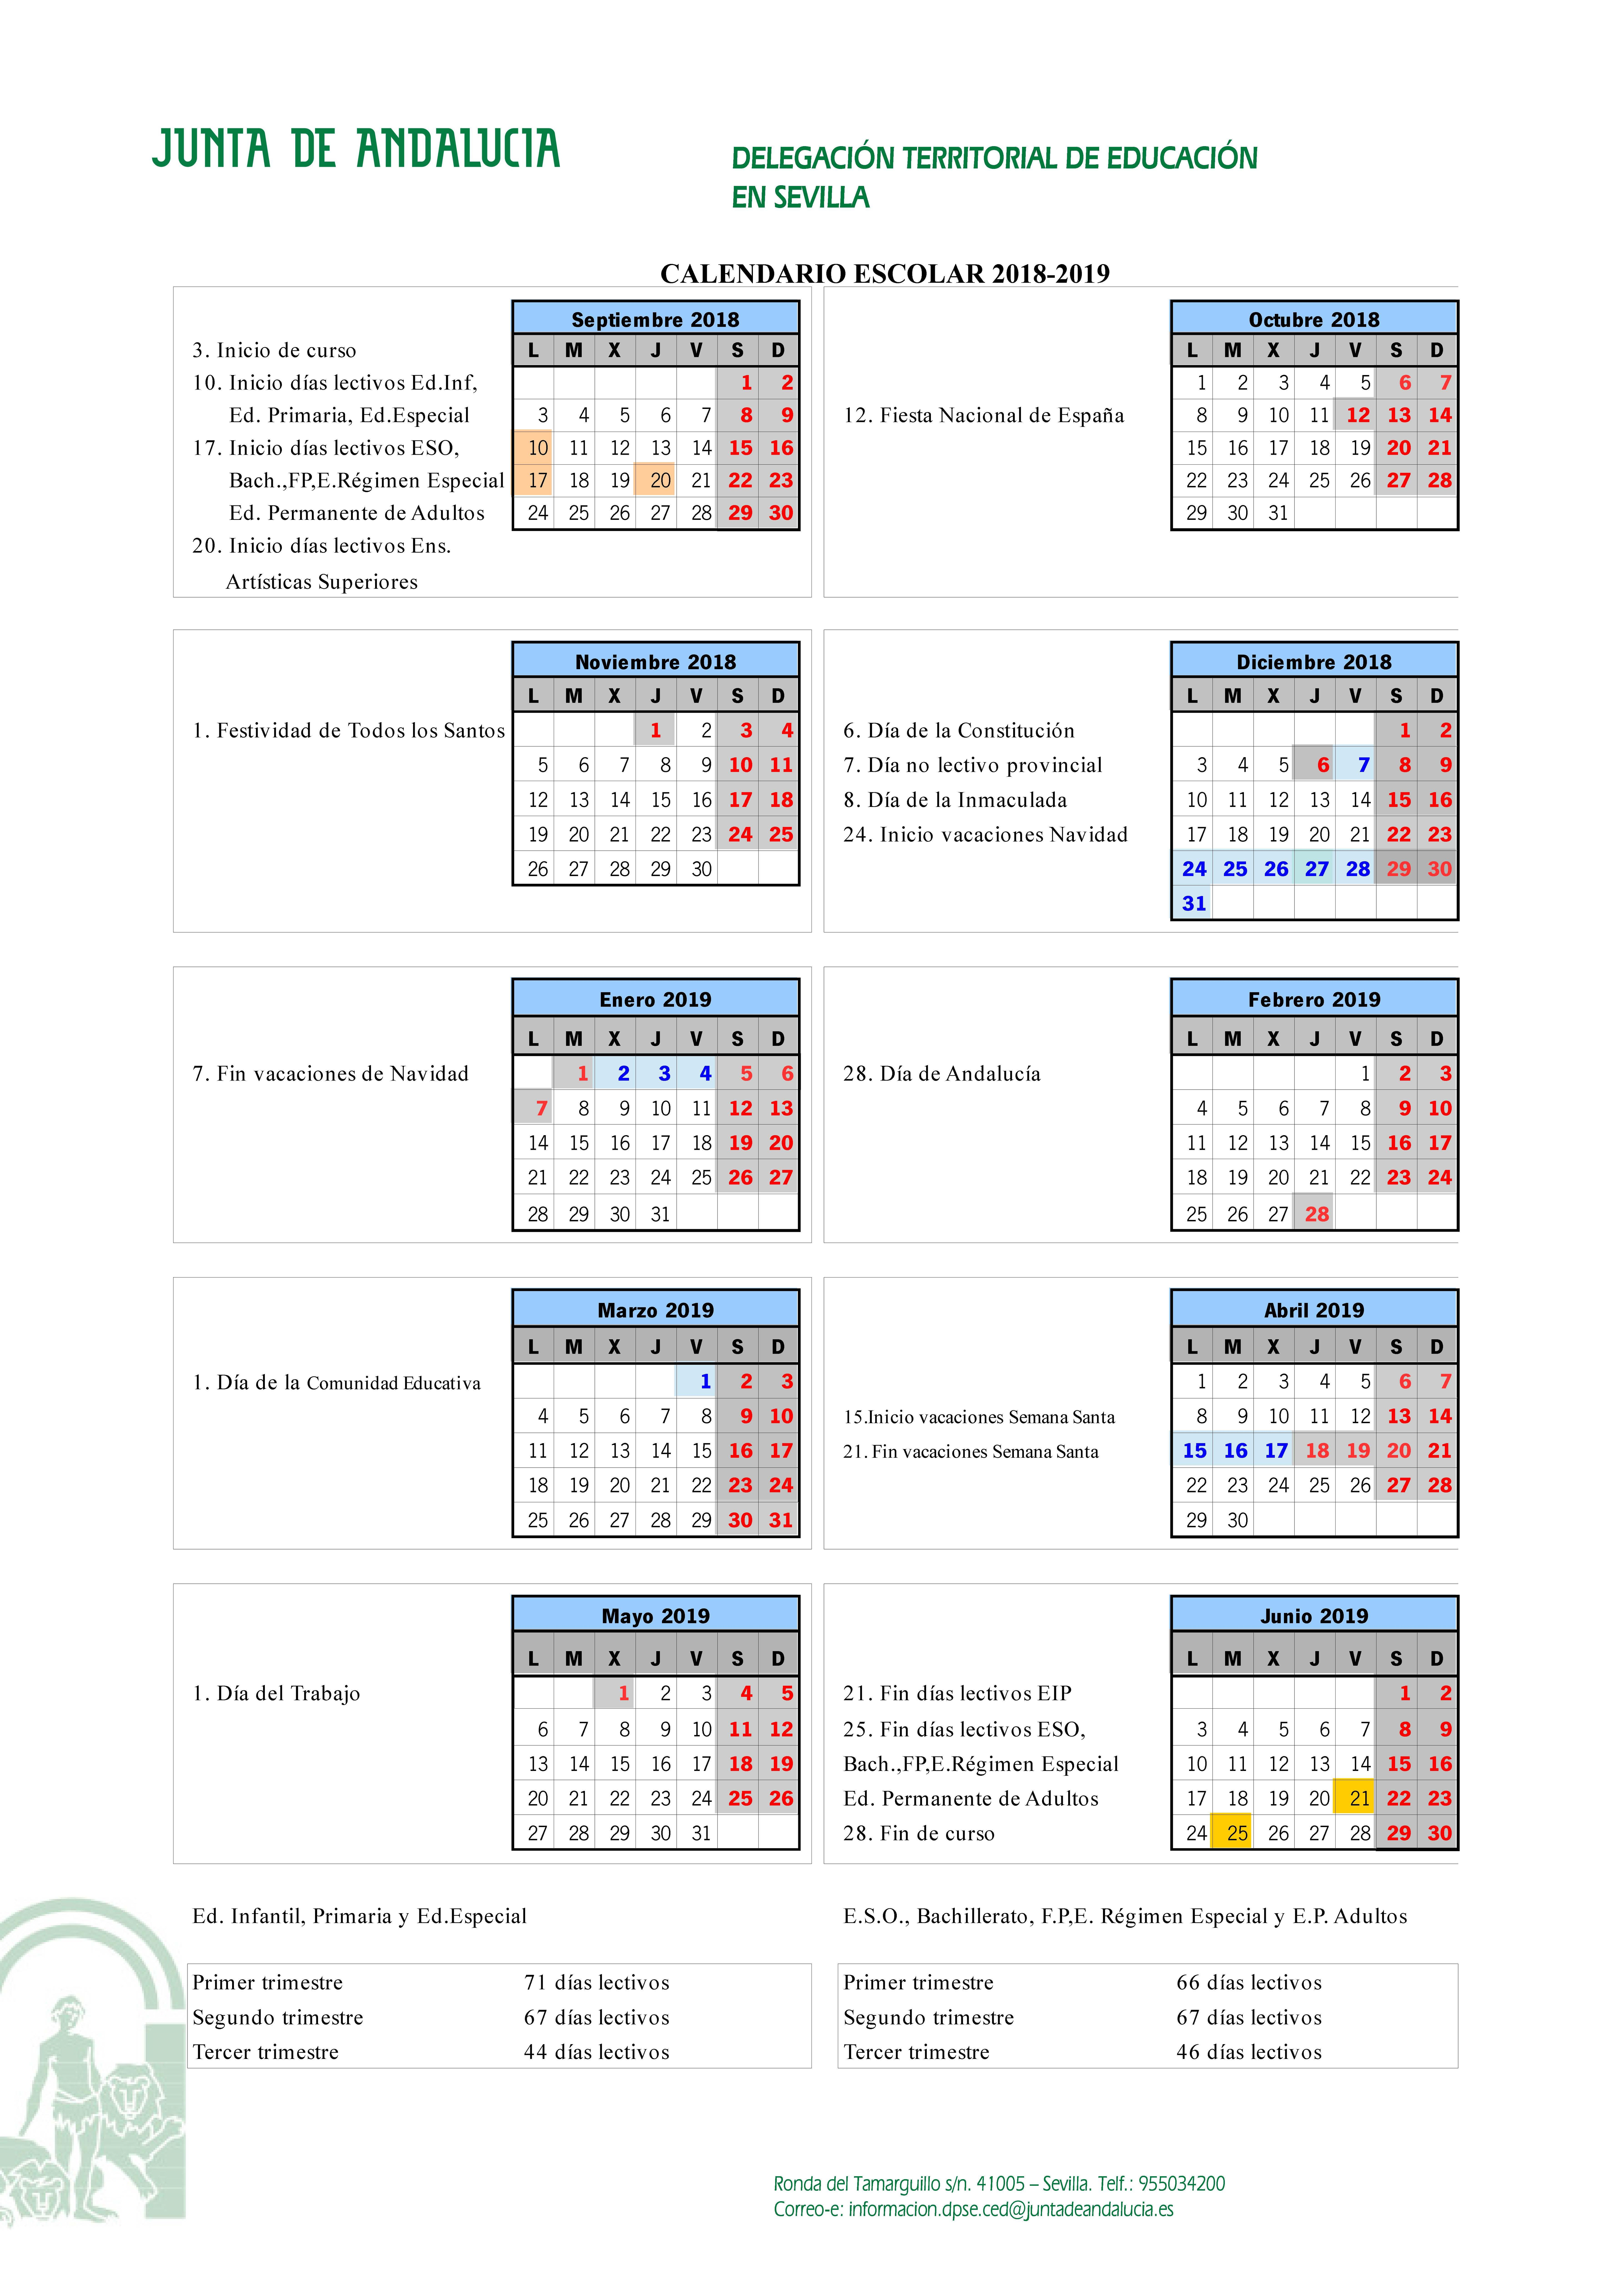 Calendario Escolar 1819.Calendario Escolar Curso 2018 19 Ies Castillo De Luna